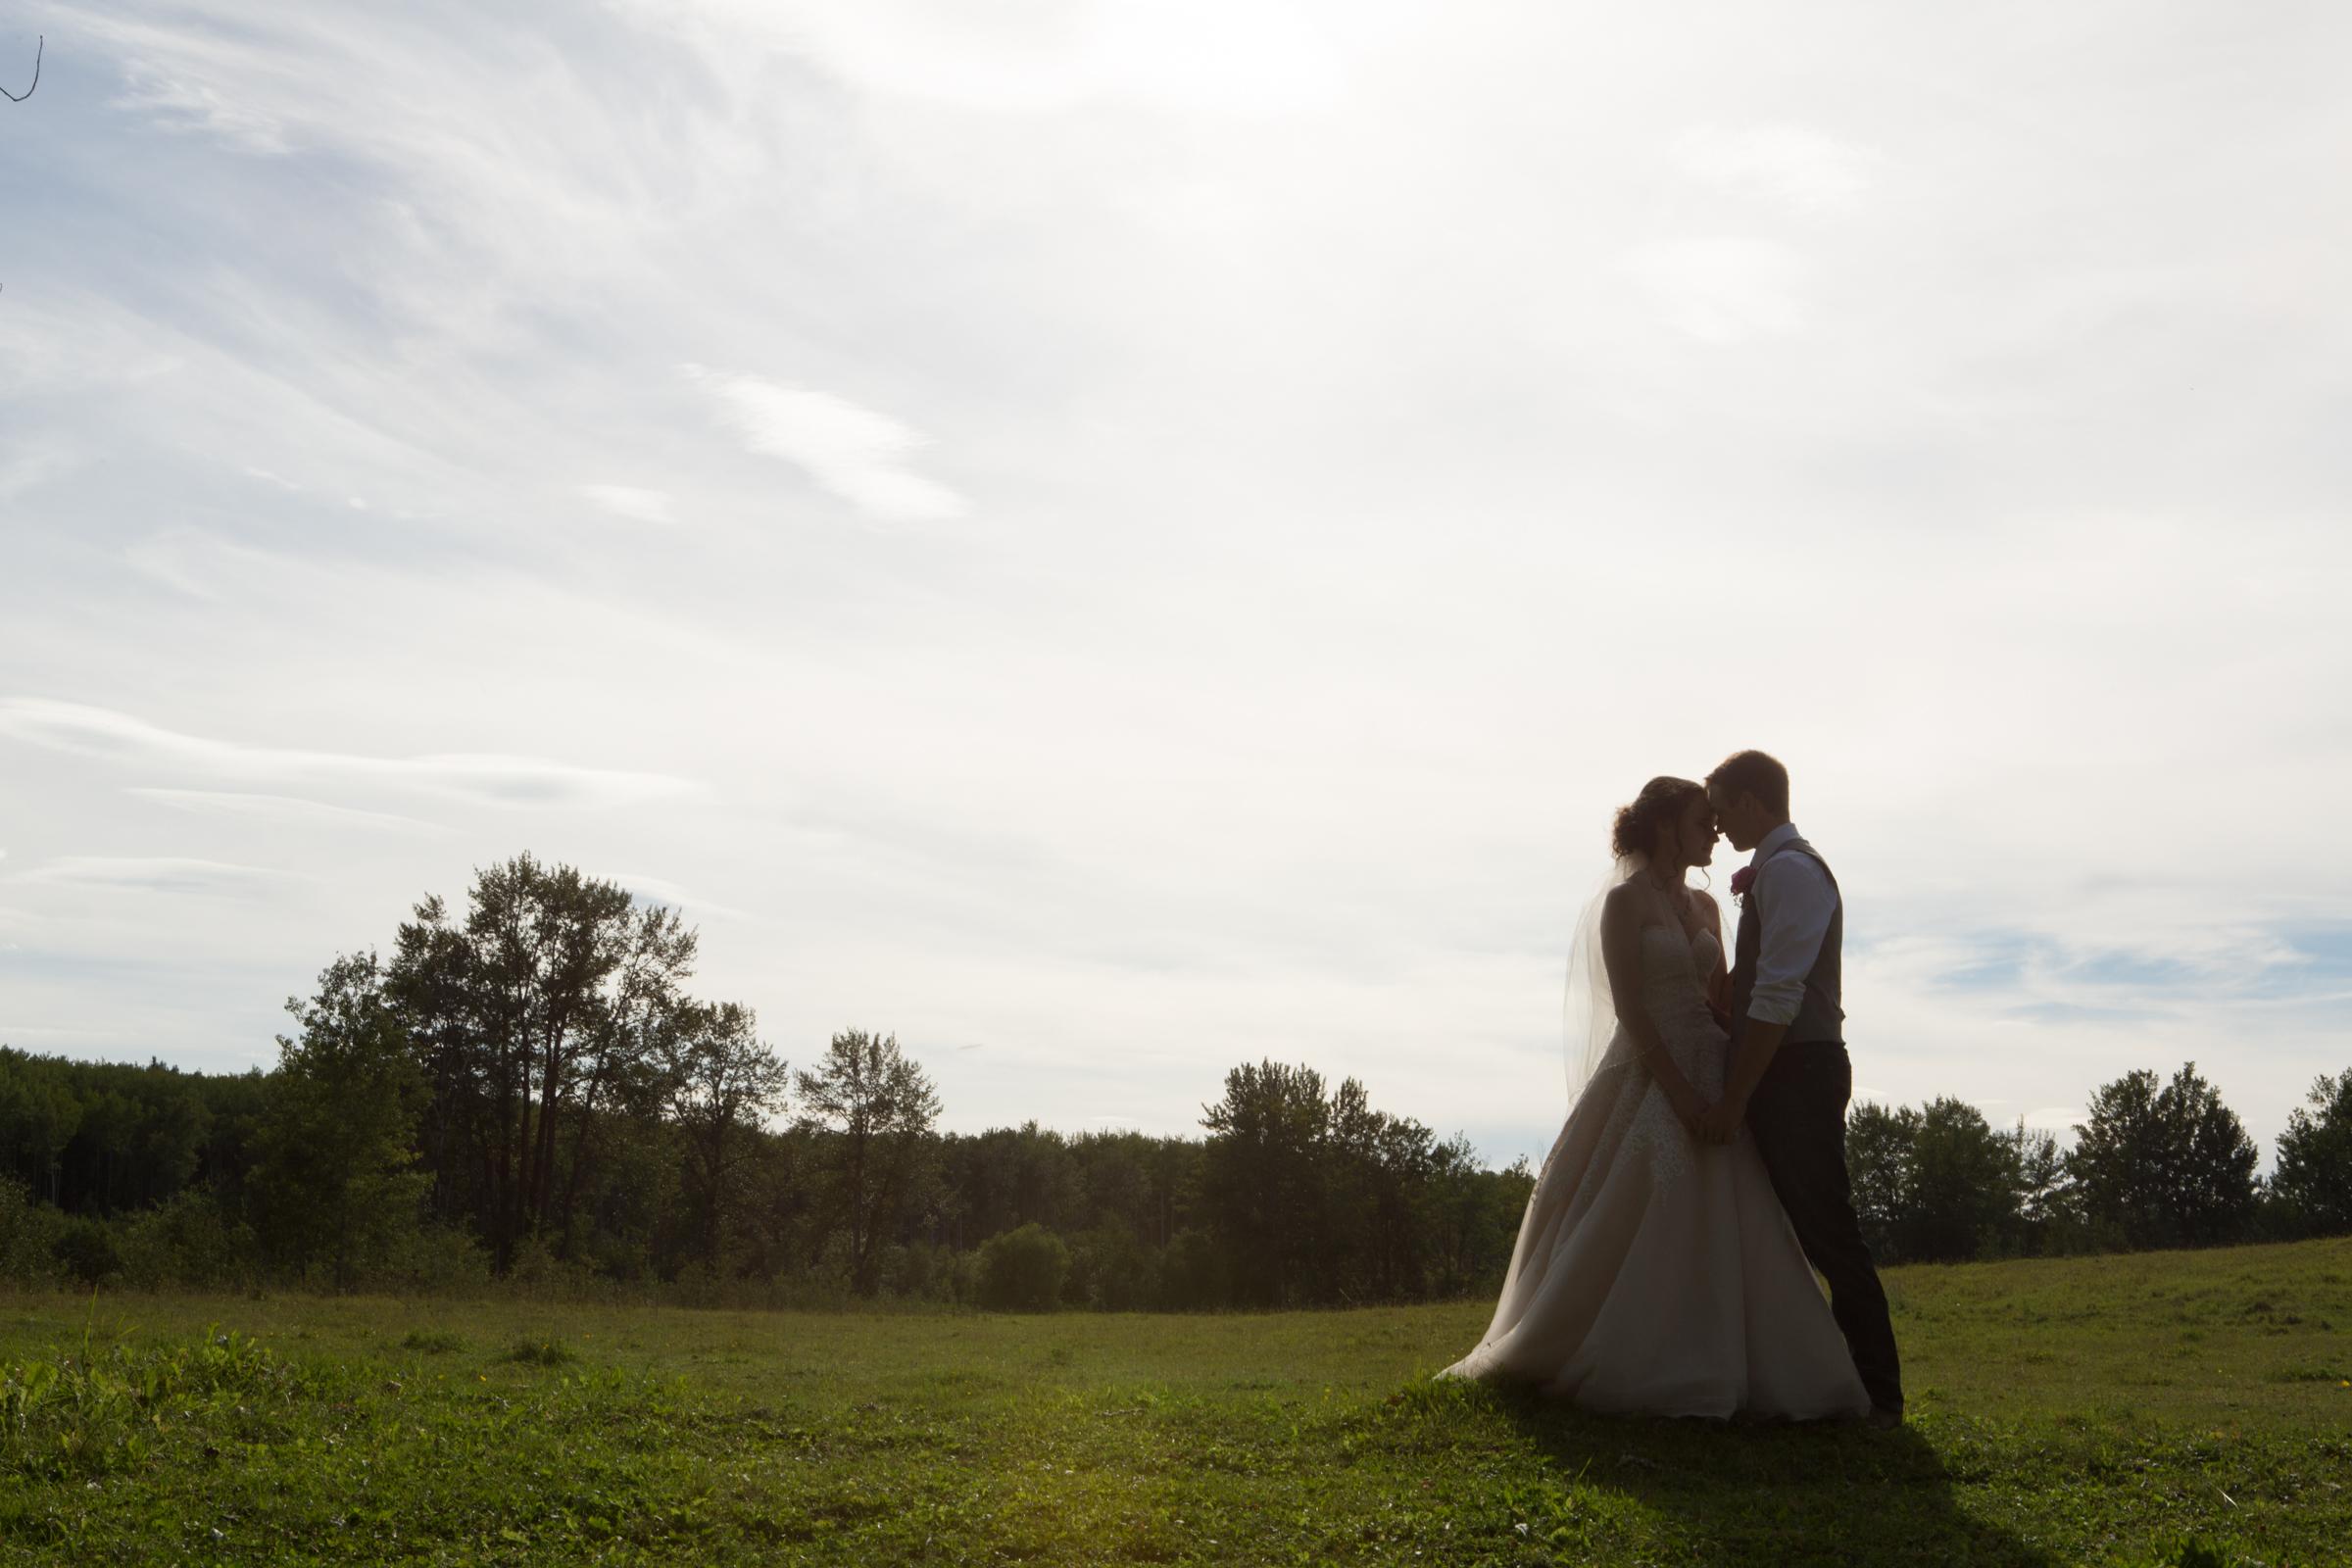 WillowBee Photo Art, Wedding photography